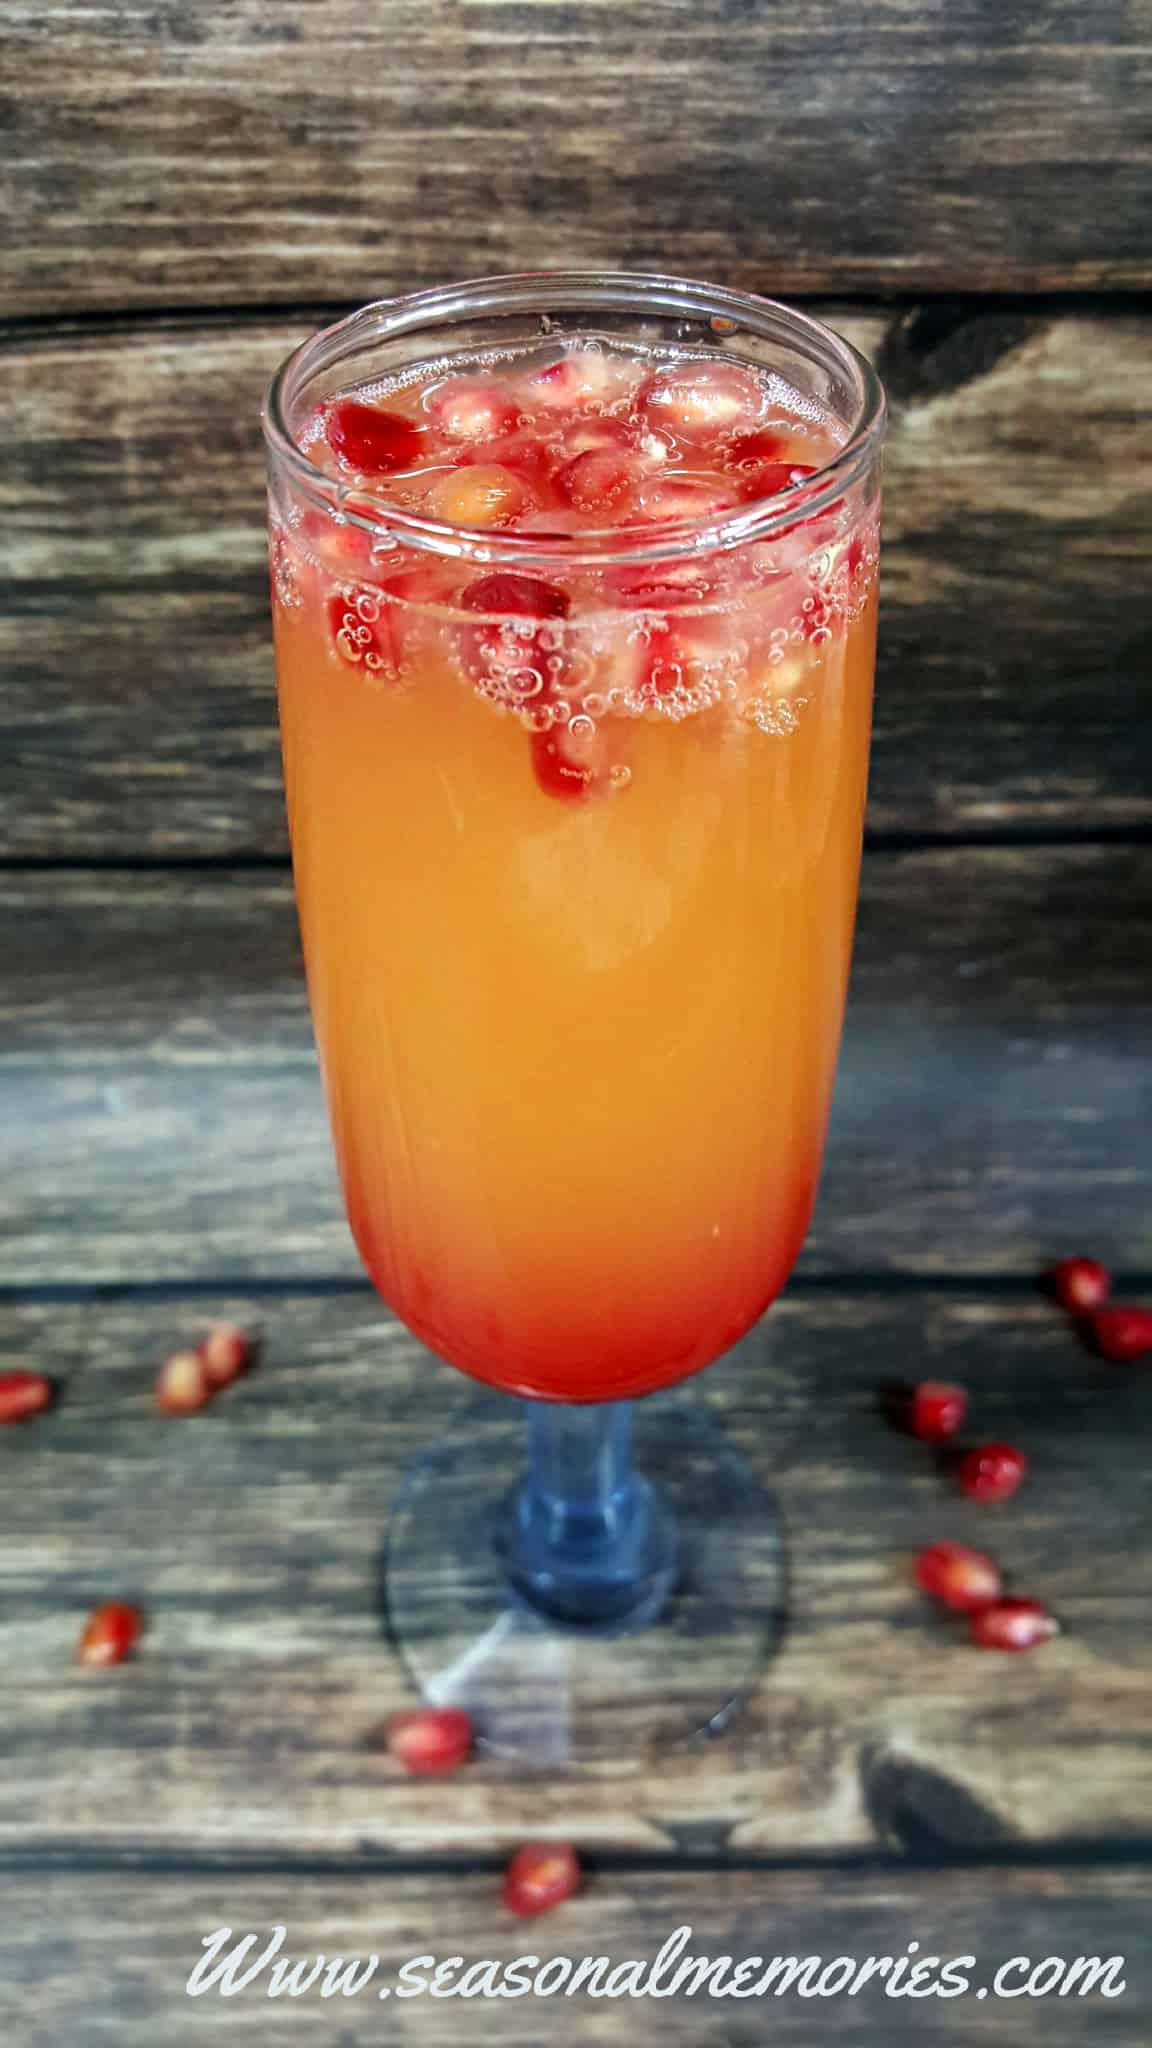 New Year's Eve Pomegranate Mimosas